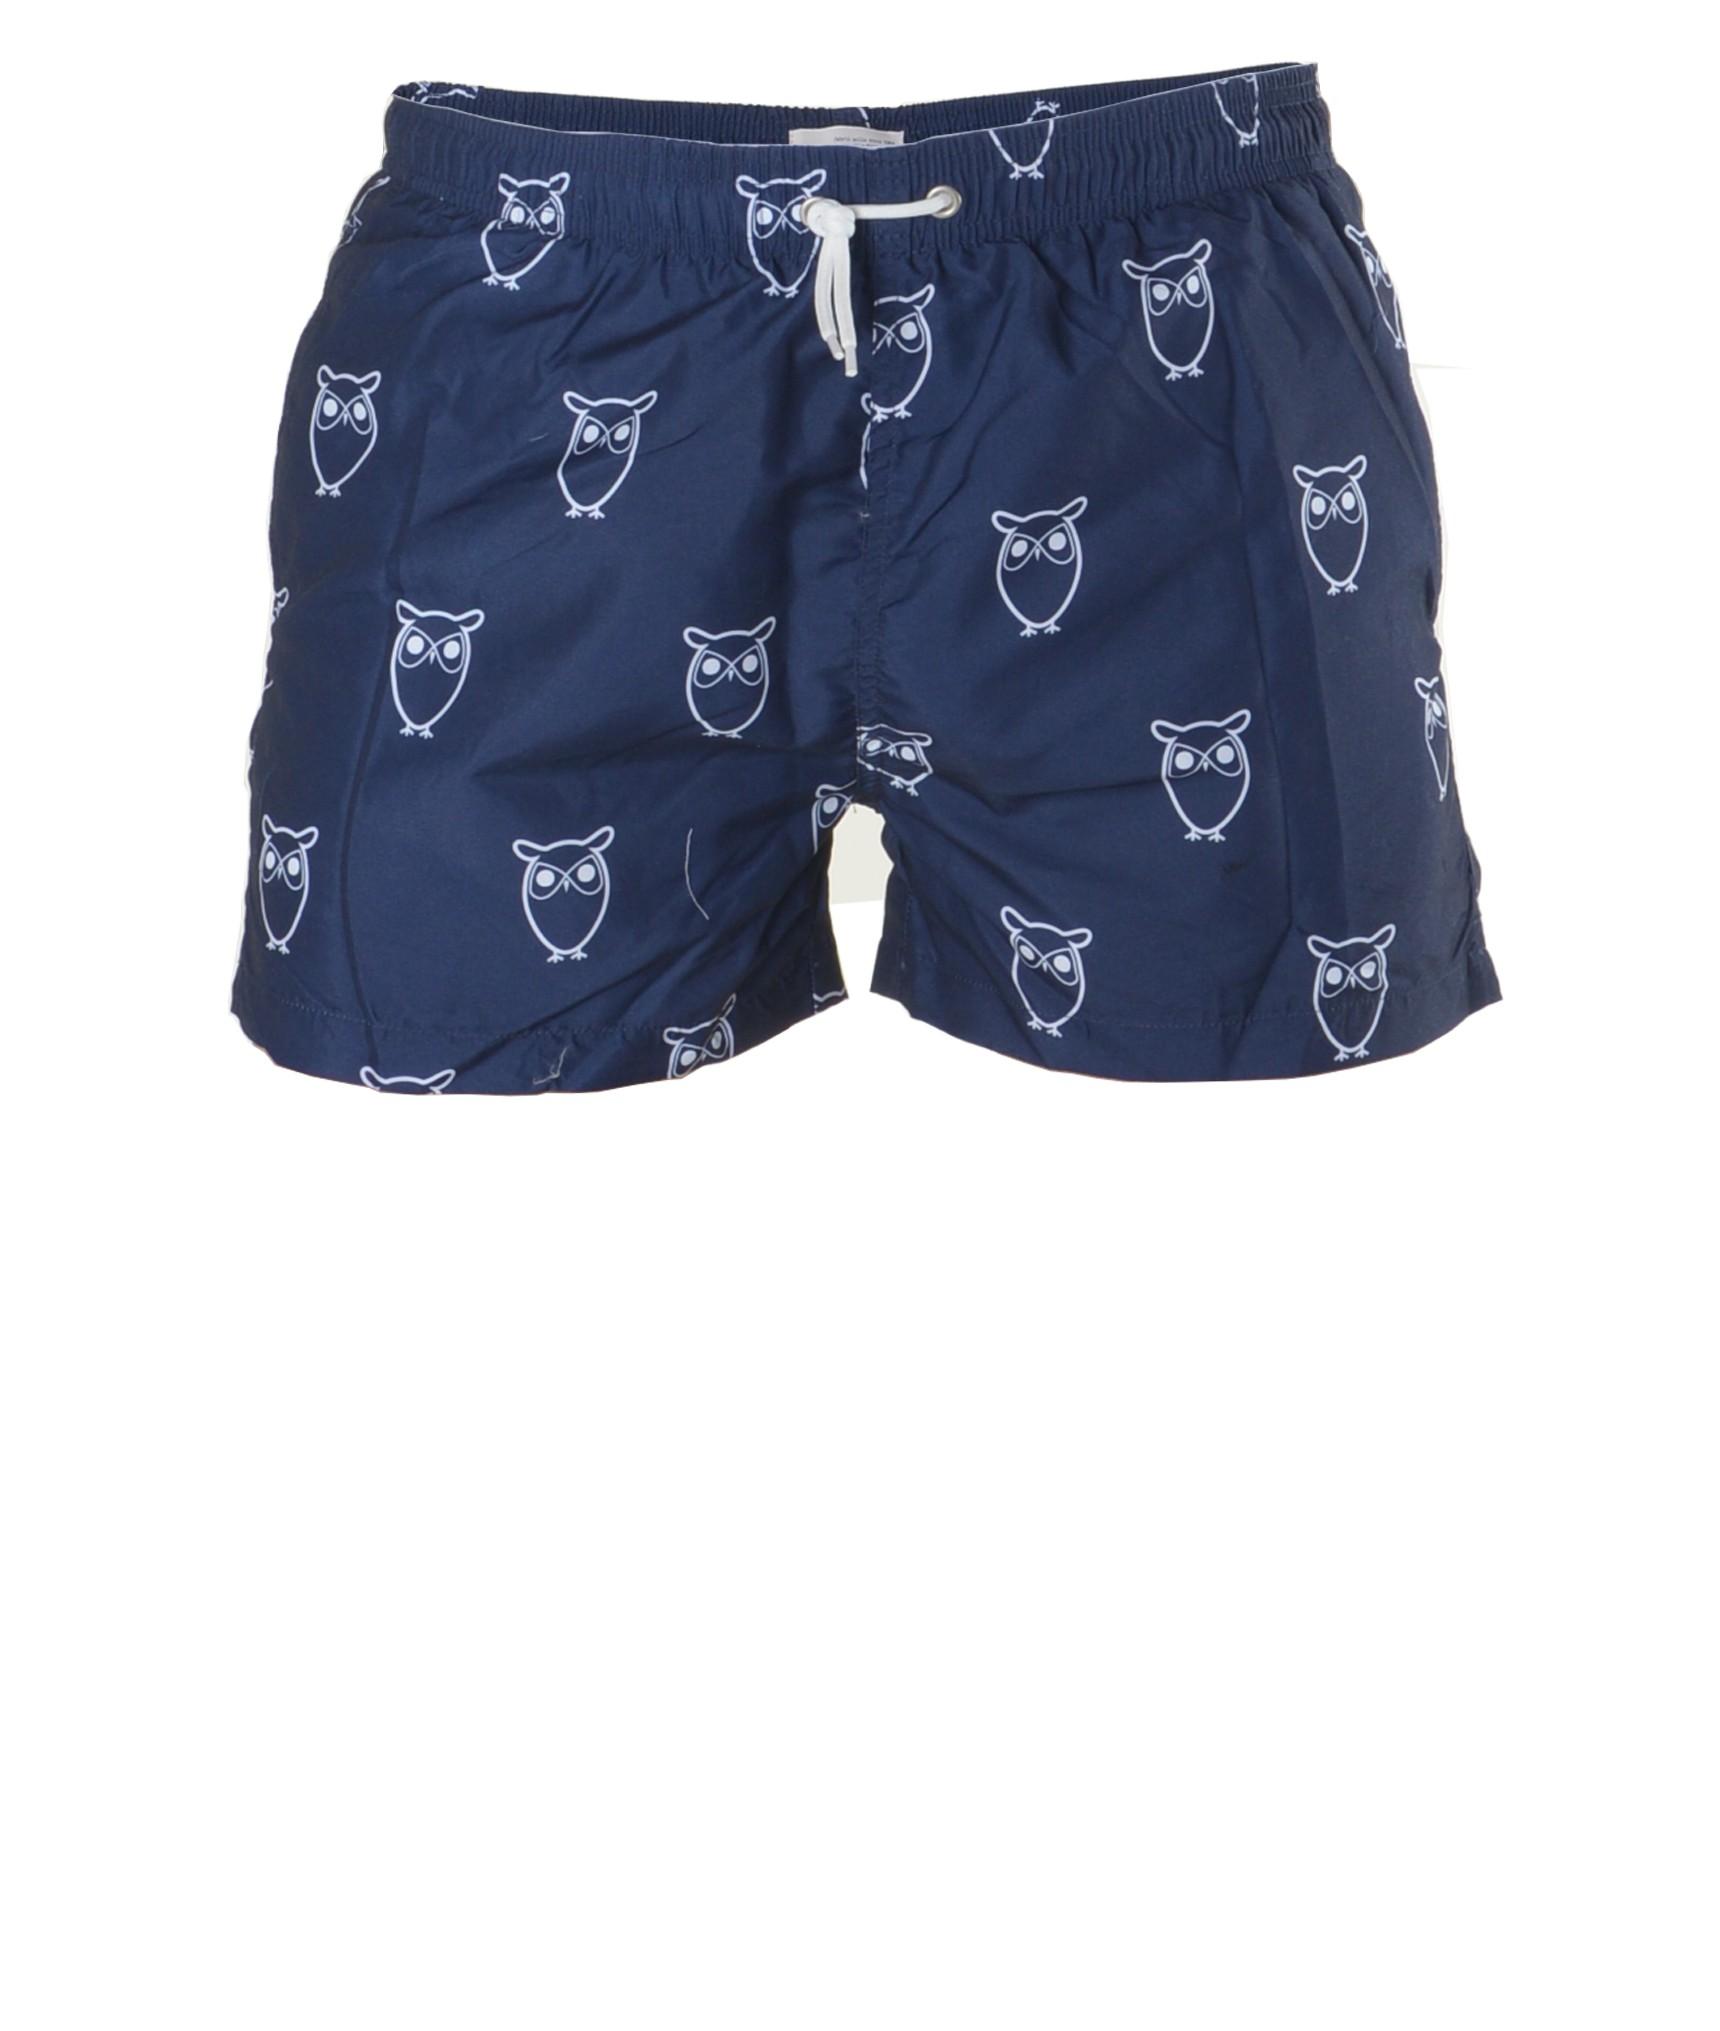 knowledge cotton apparel swim shorts w owl print bademode ko badeshorts f r m nner glore. Black Bedroom Furniture Sets. Home Design Ideas